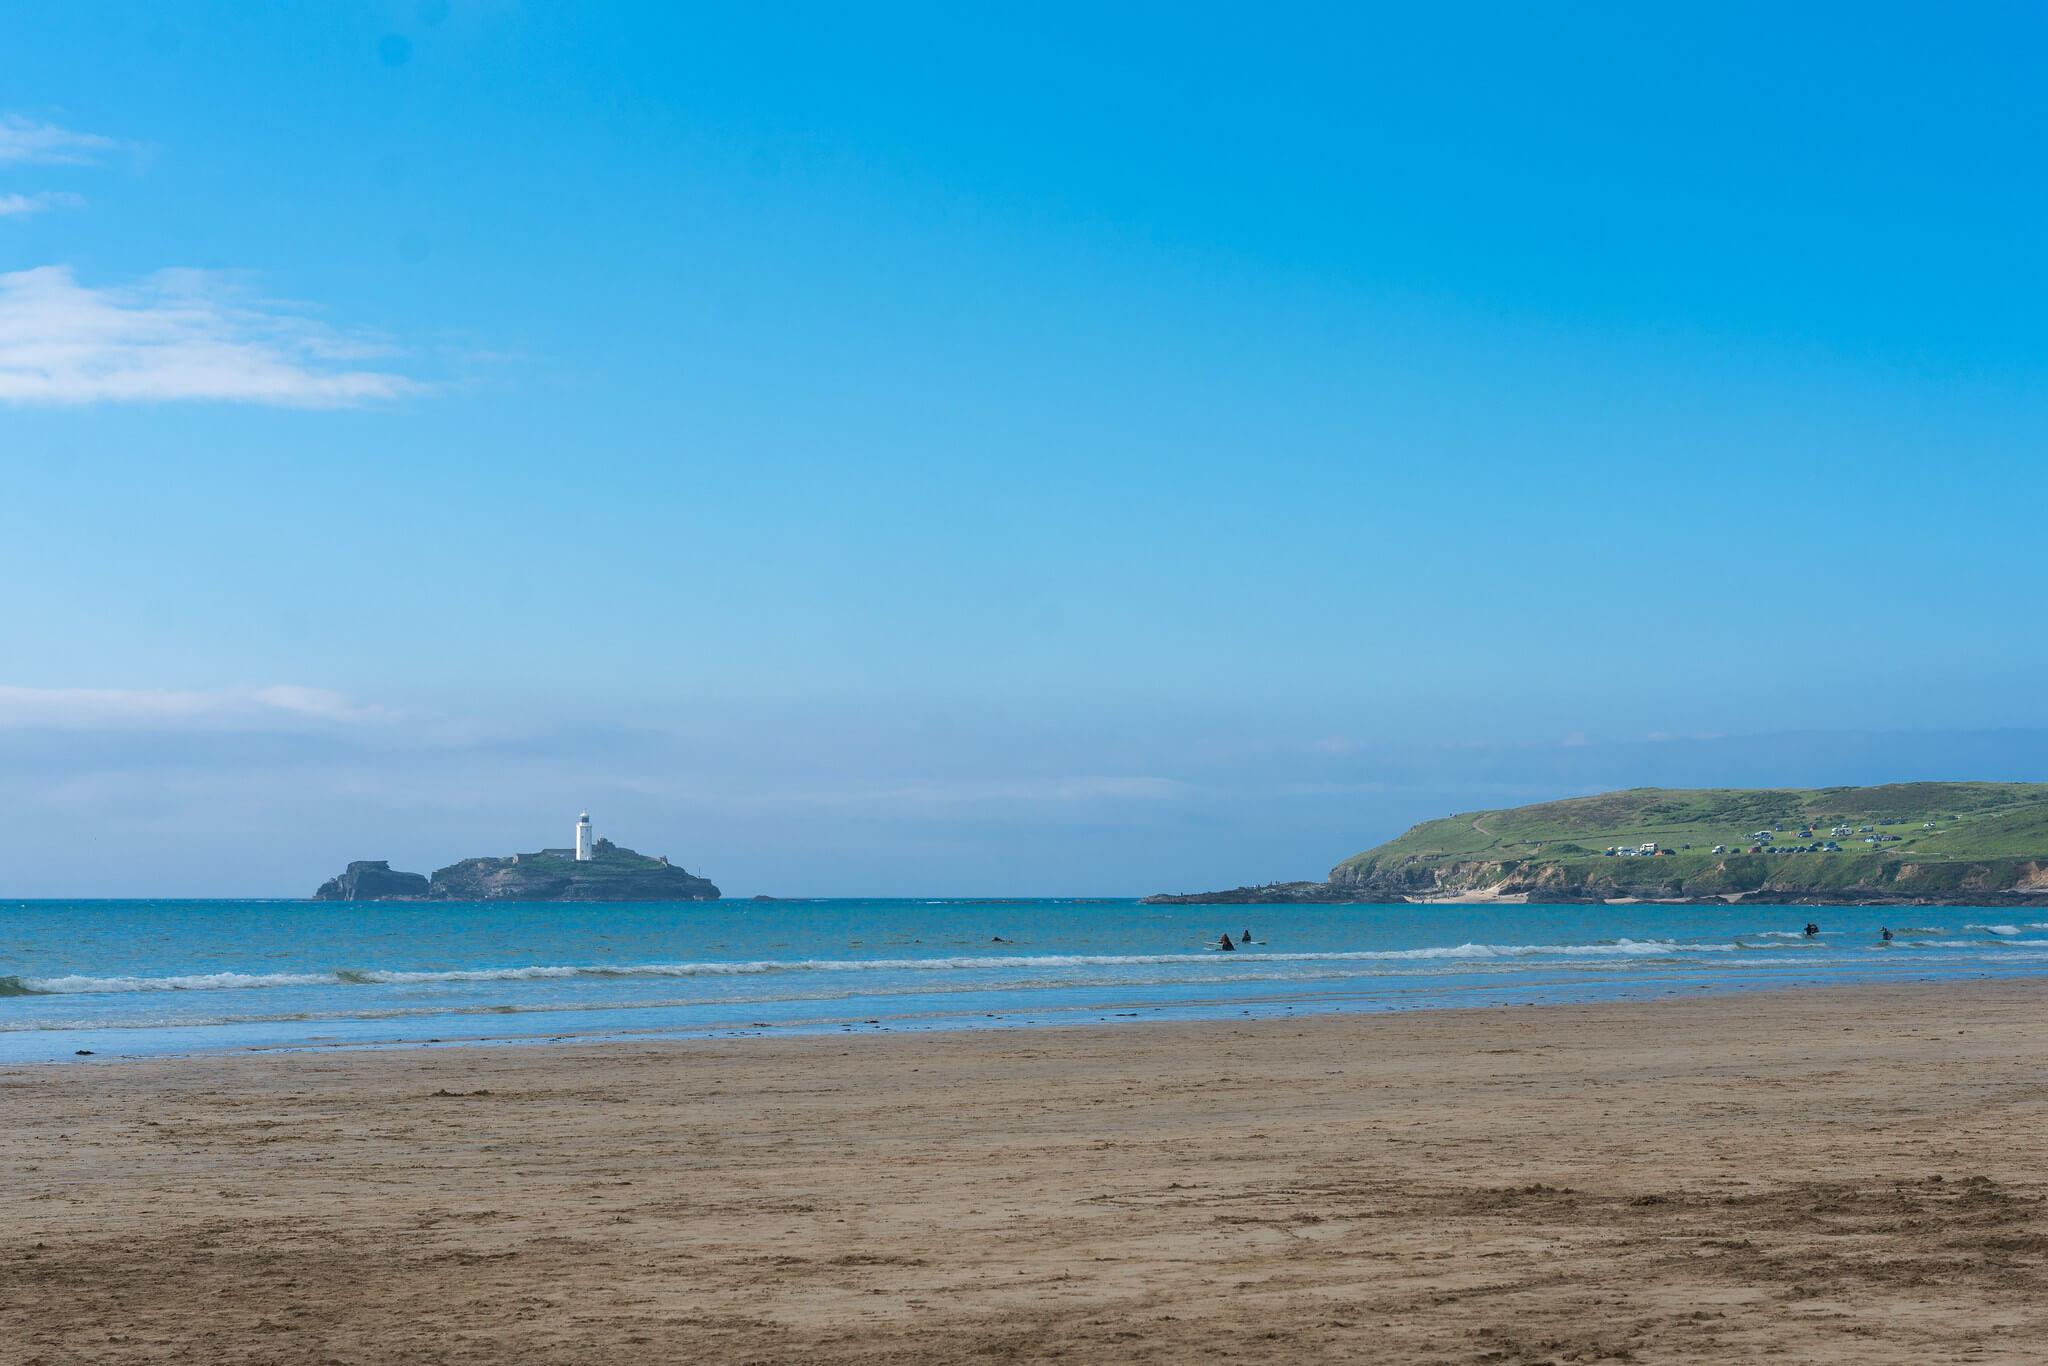 Gwithian Towans Body Boarding Beach